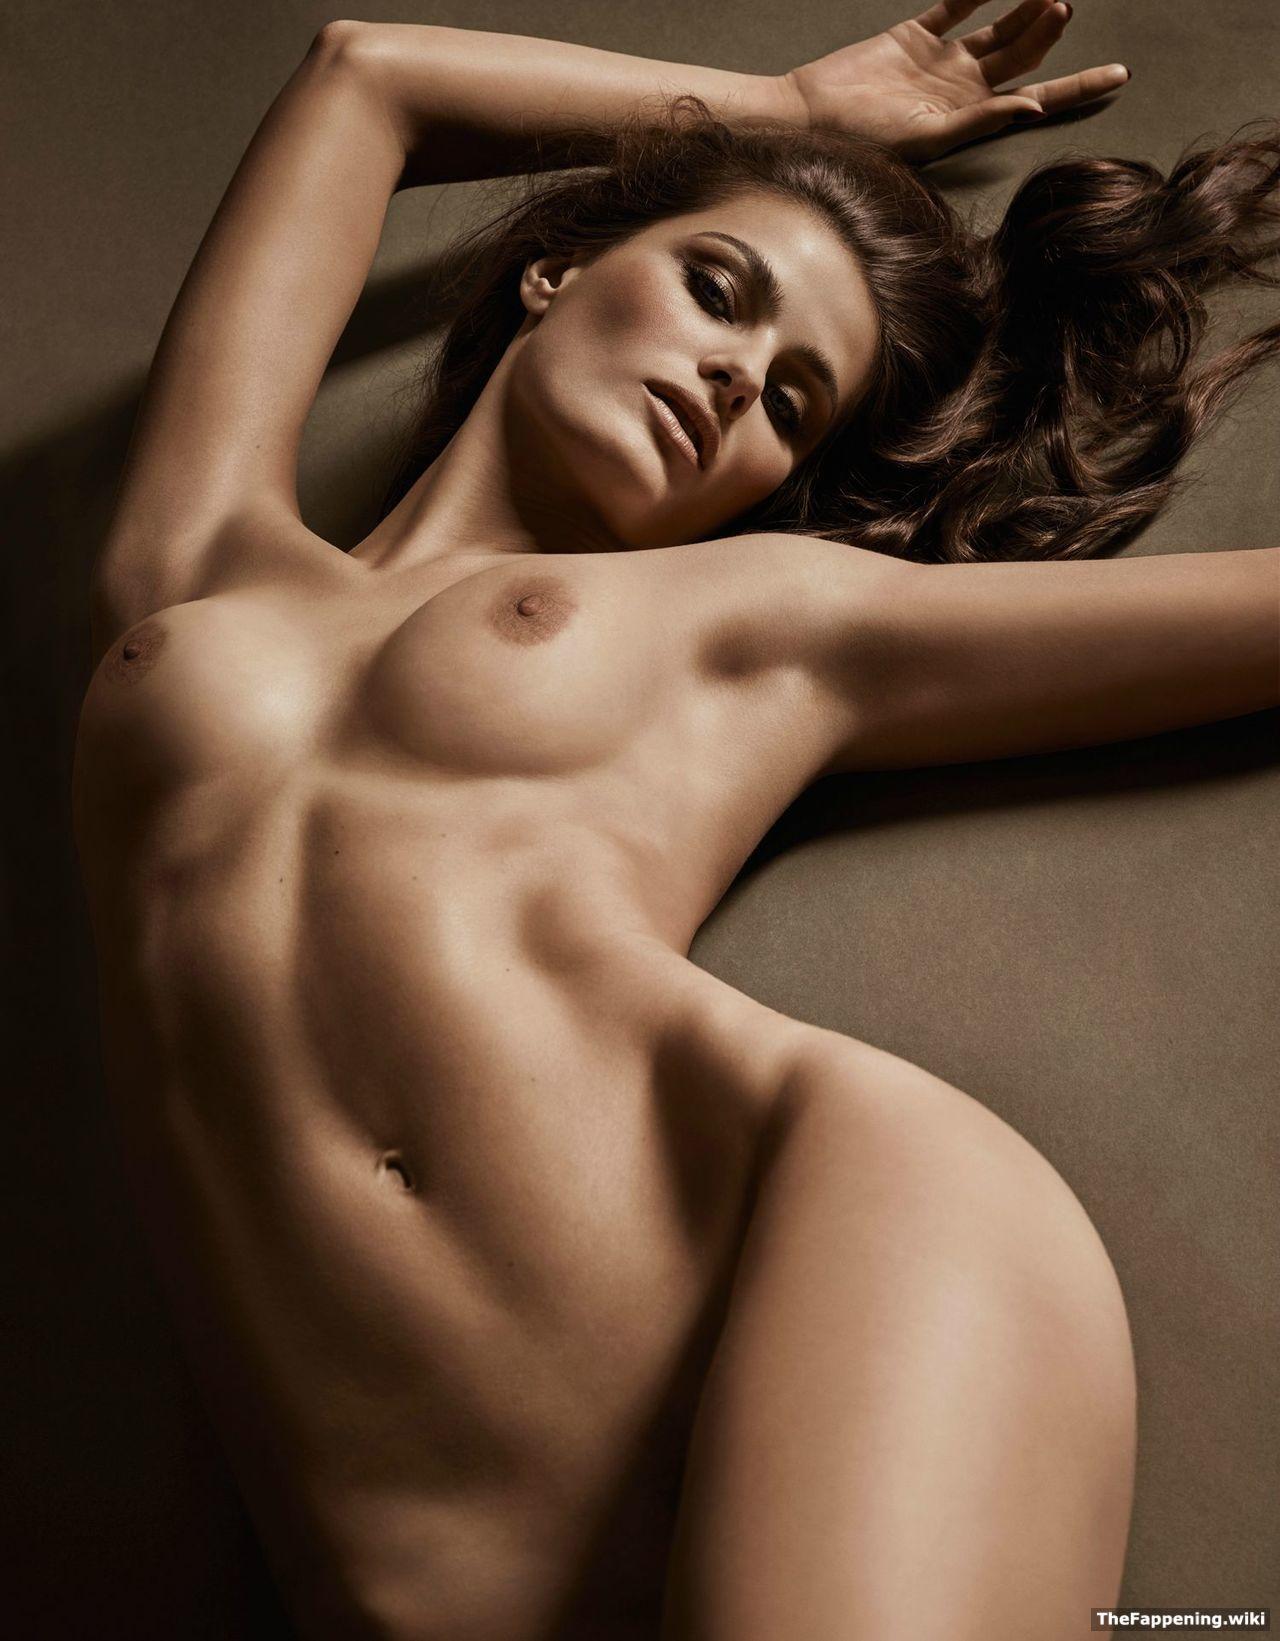 Naked photos of isabeli fontana